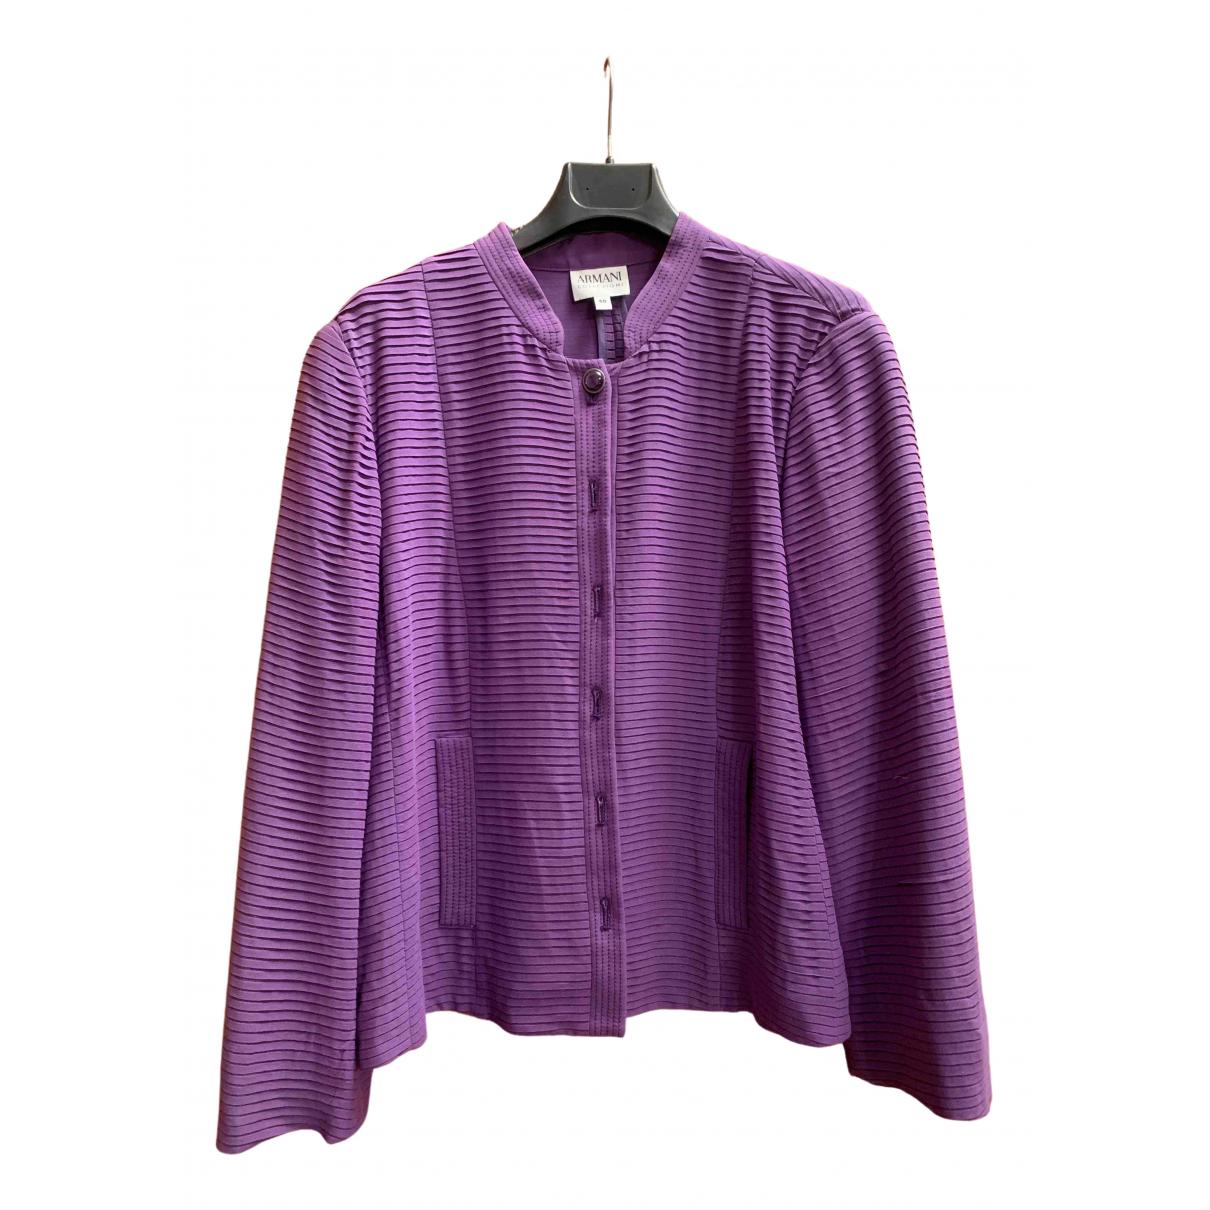 Armani Collezioni \N Purple Silk jacket for Women 50-52 IT